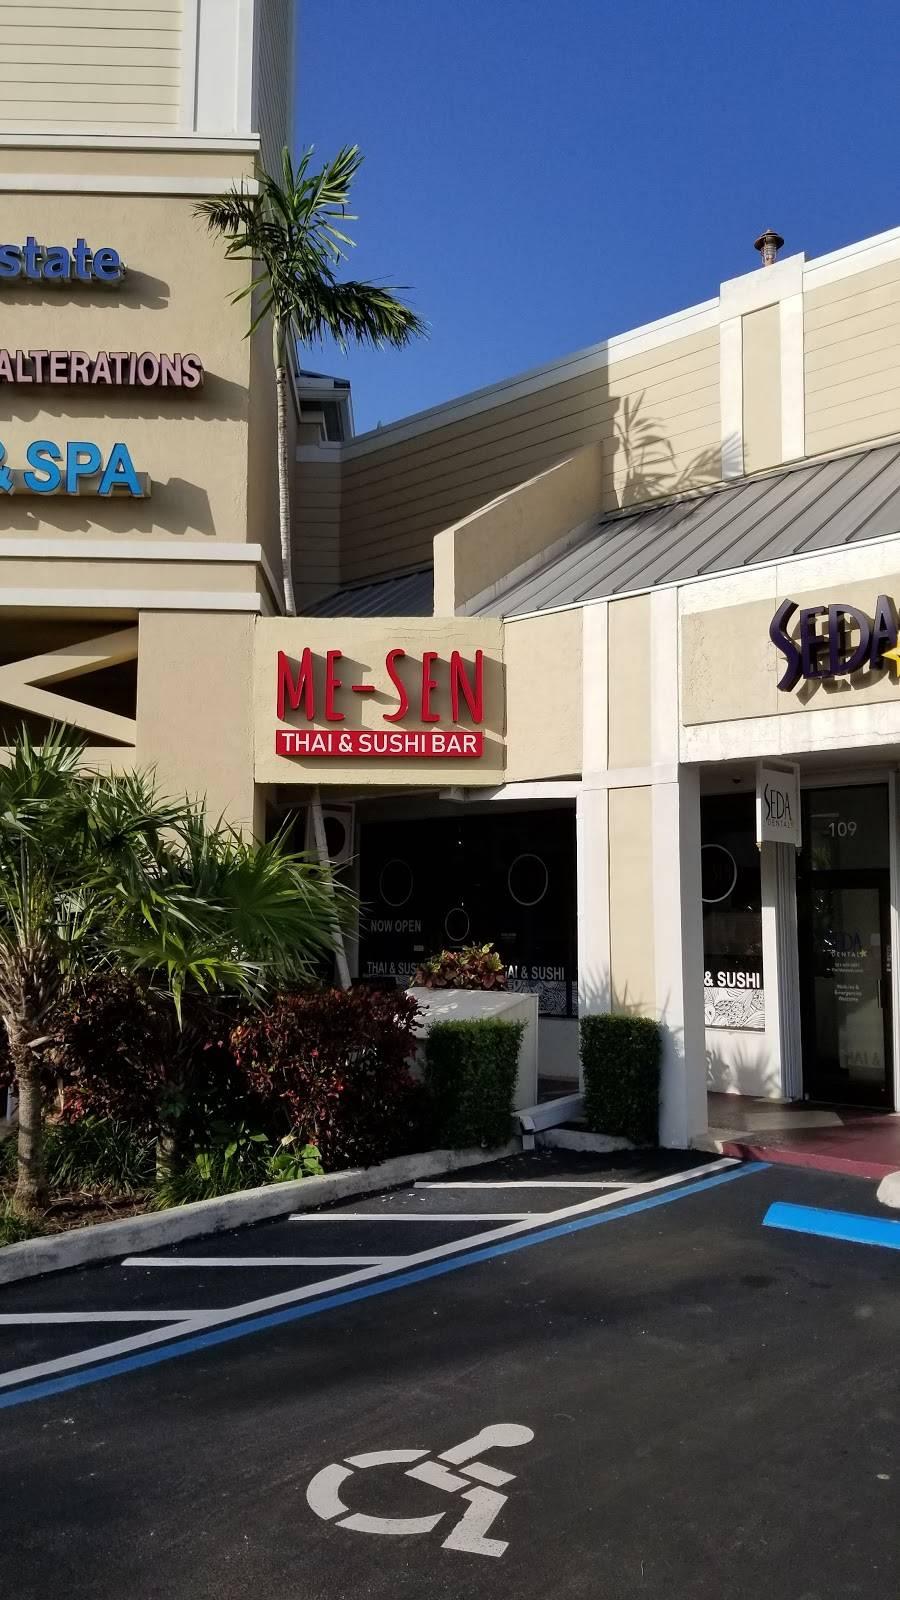 Me-Sen Thai & Sushi Bar | restaurant | 6063 SW 18th St, Boca Raton, FL 33433, USA | 5615716024 OR +1 561-571-6024